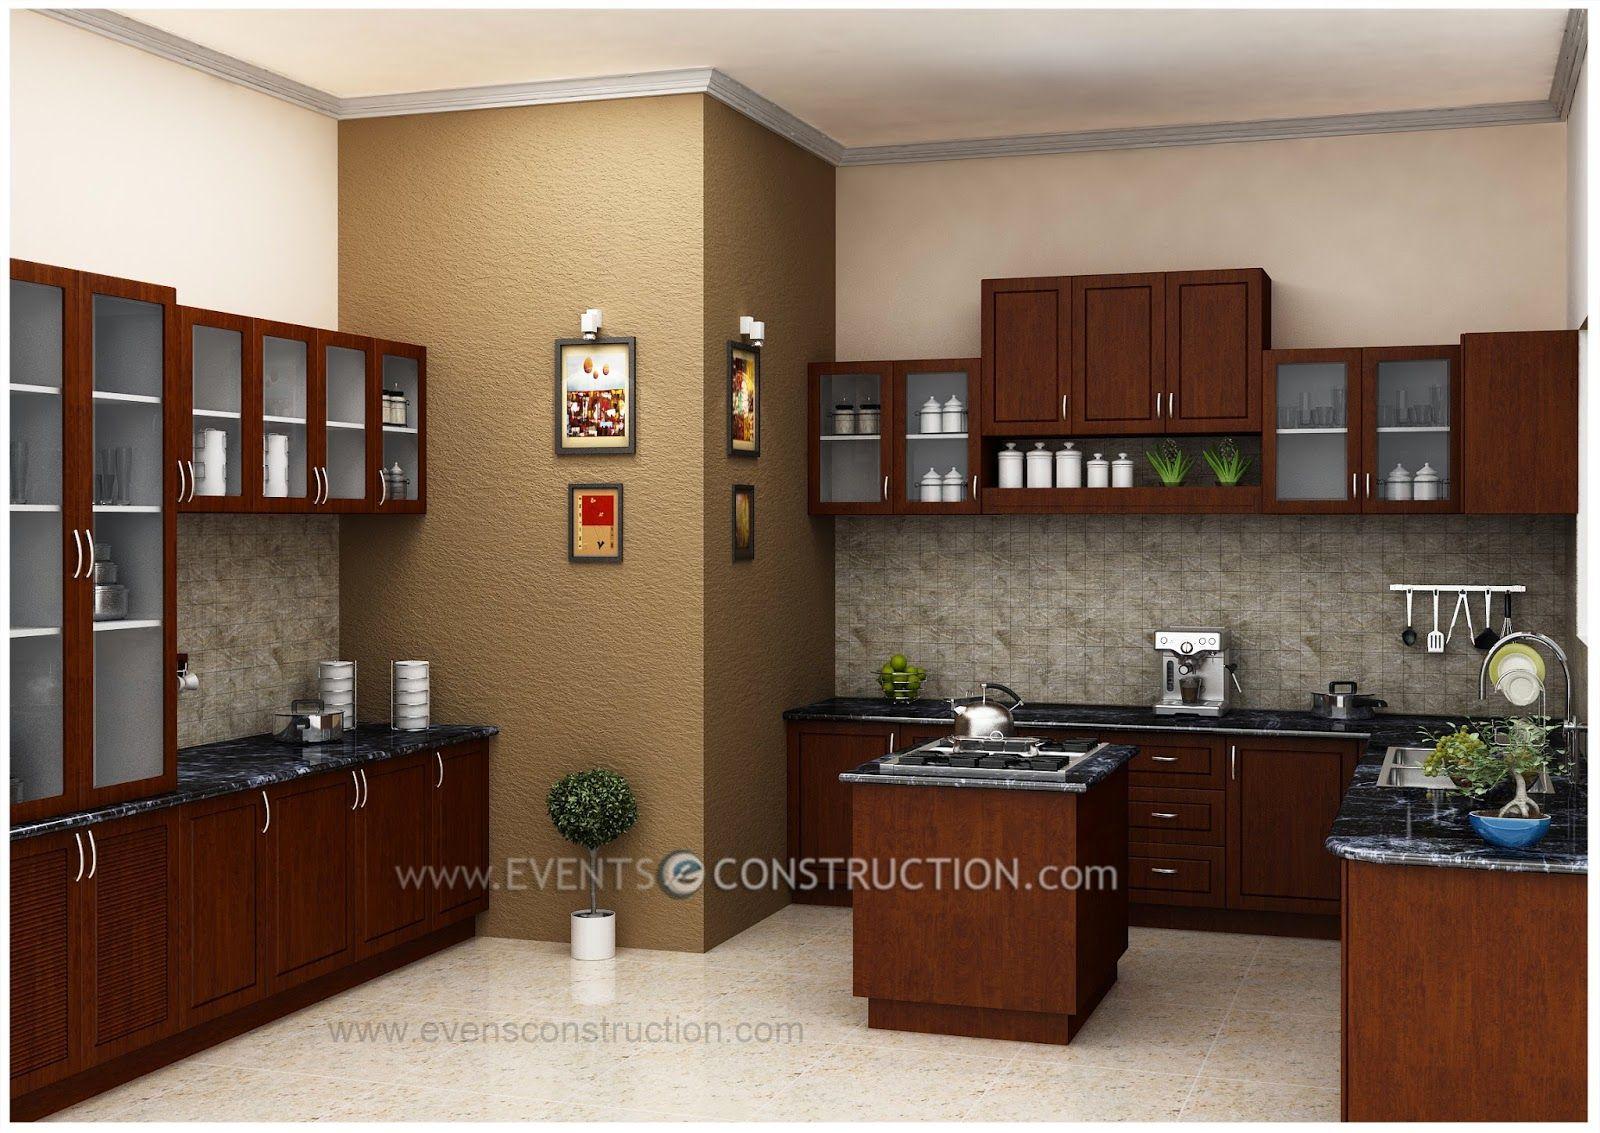 kerala courtyard images  google search  model kitchen